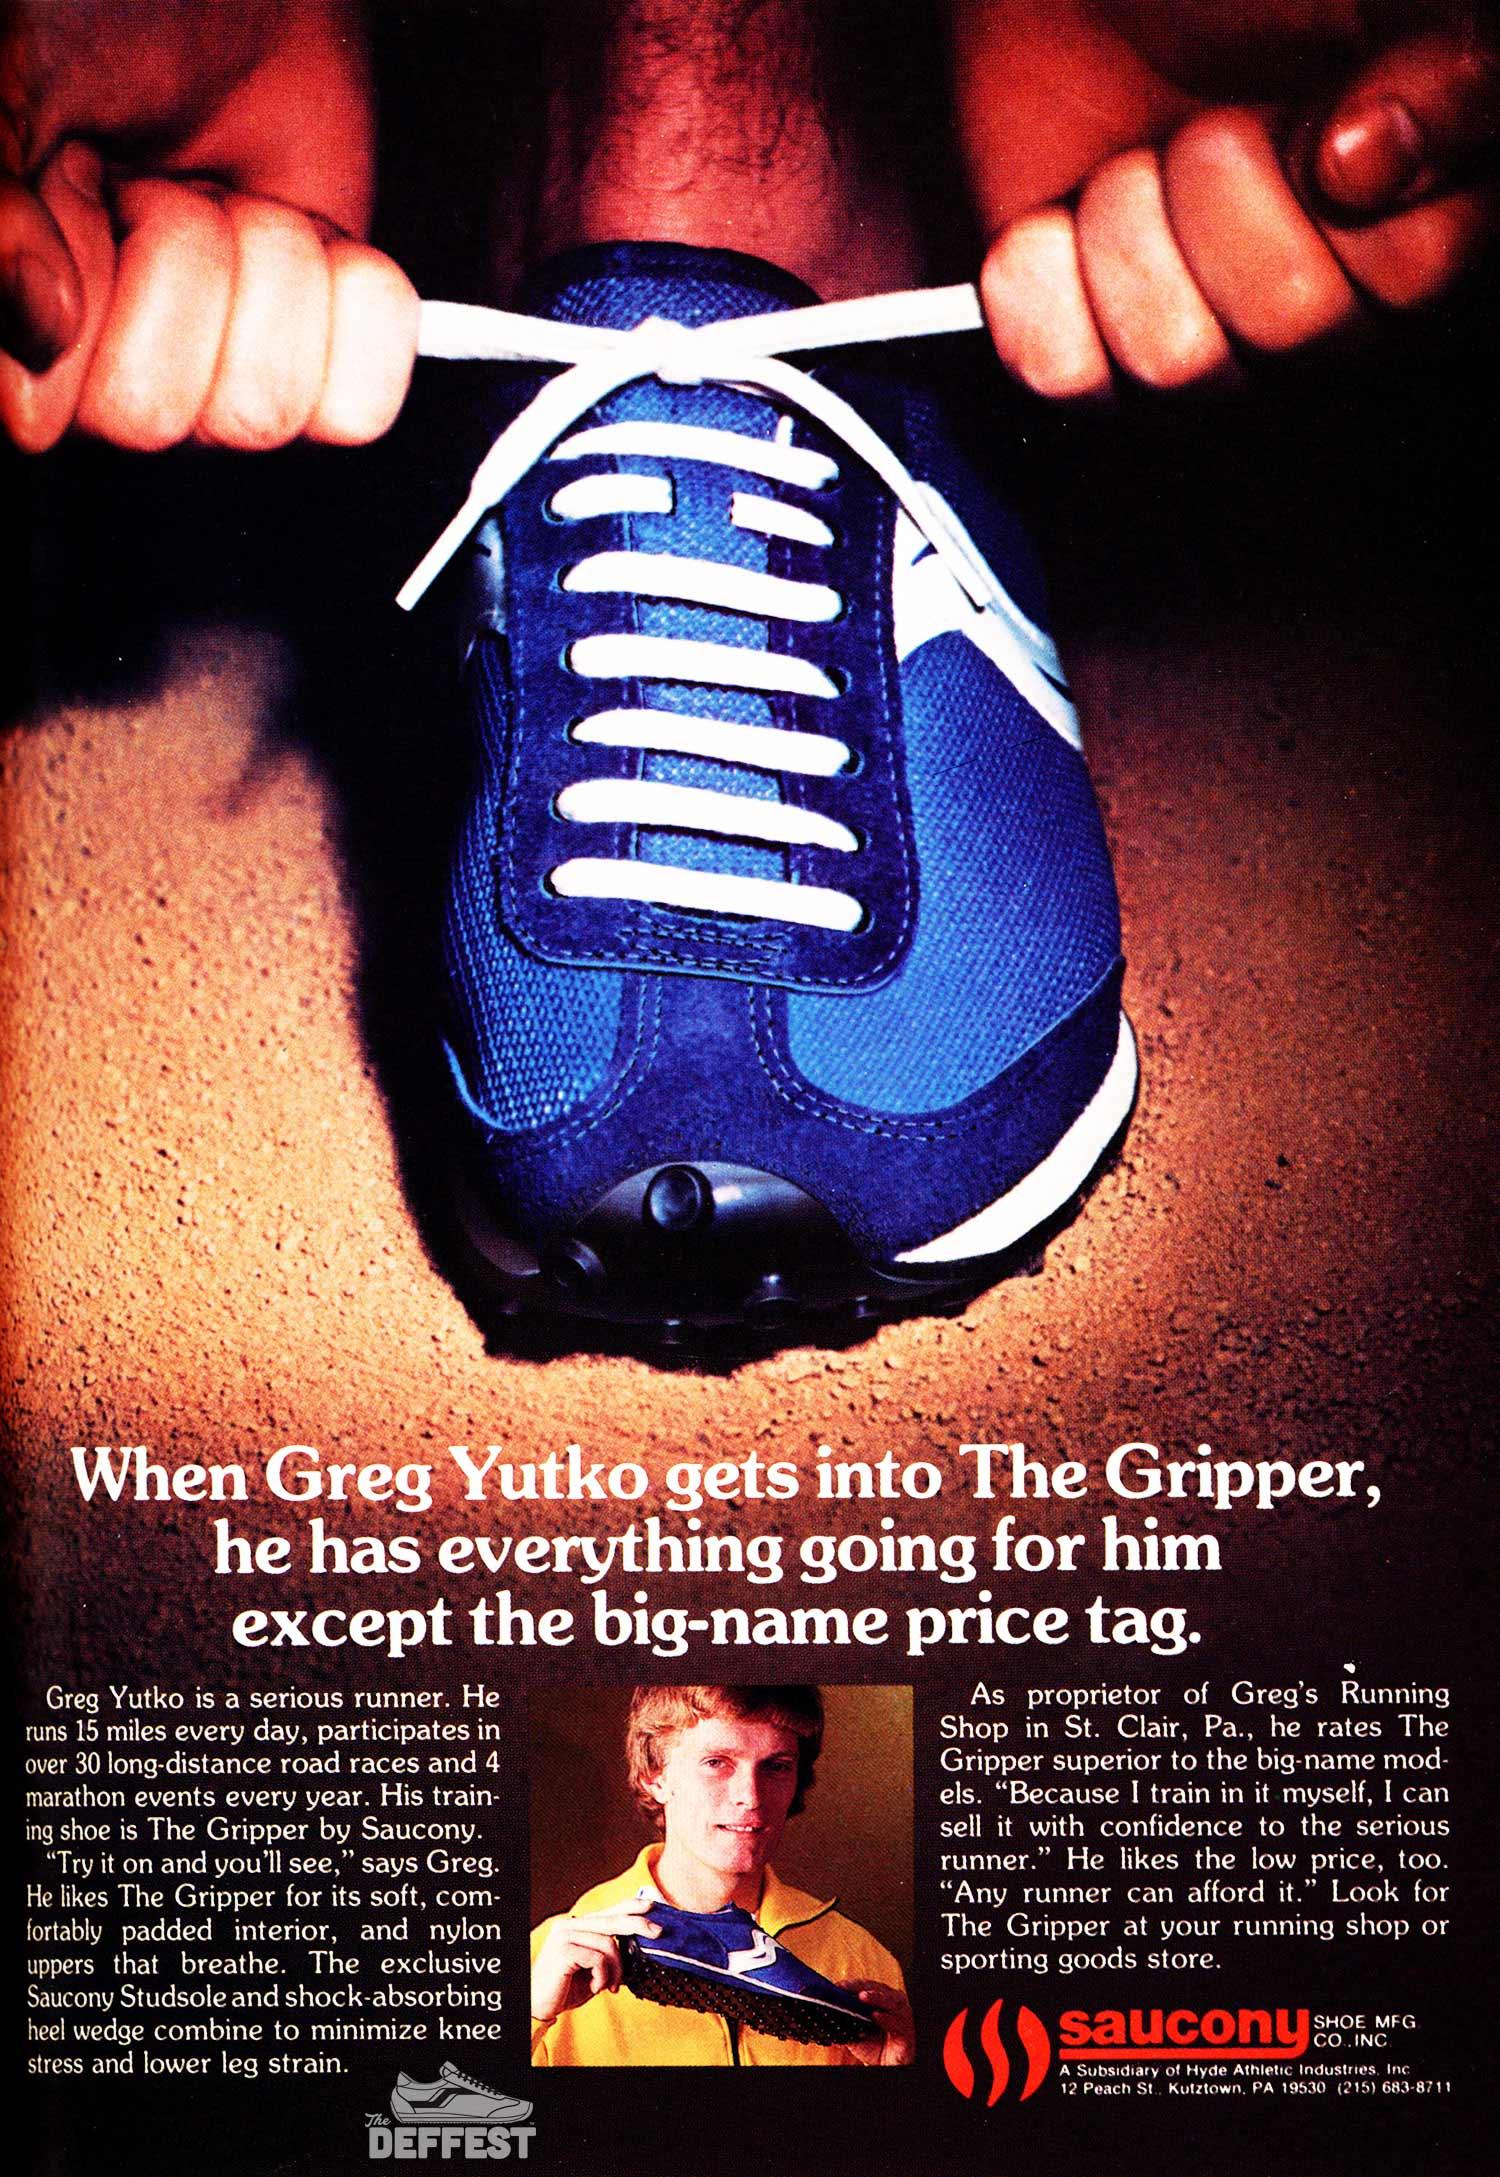 79a0092a2da Late 70s Saucony Gripper vintage sneaker ad @ The Deffest